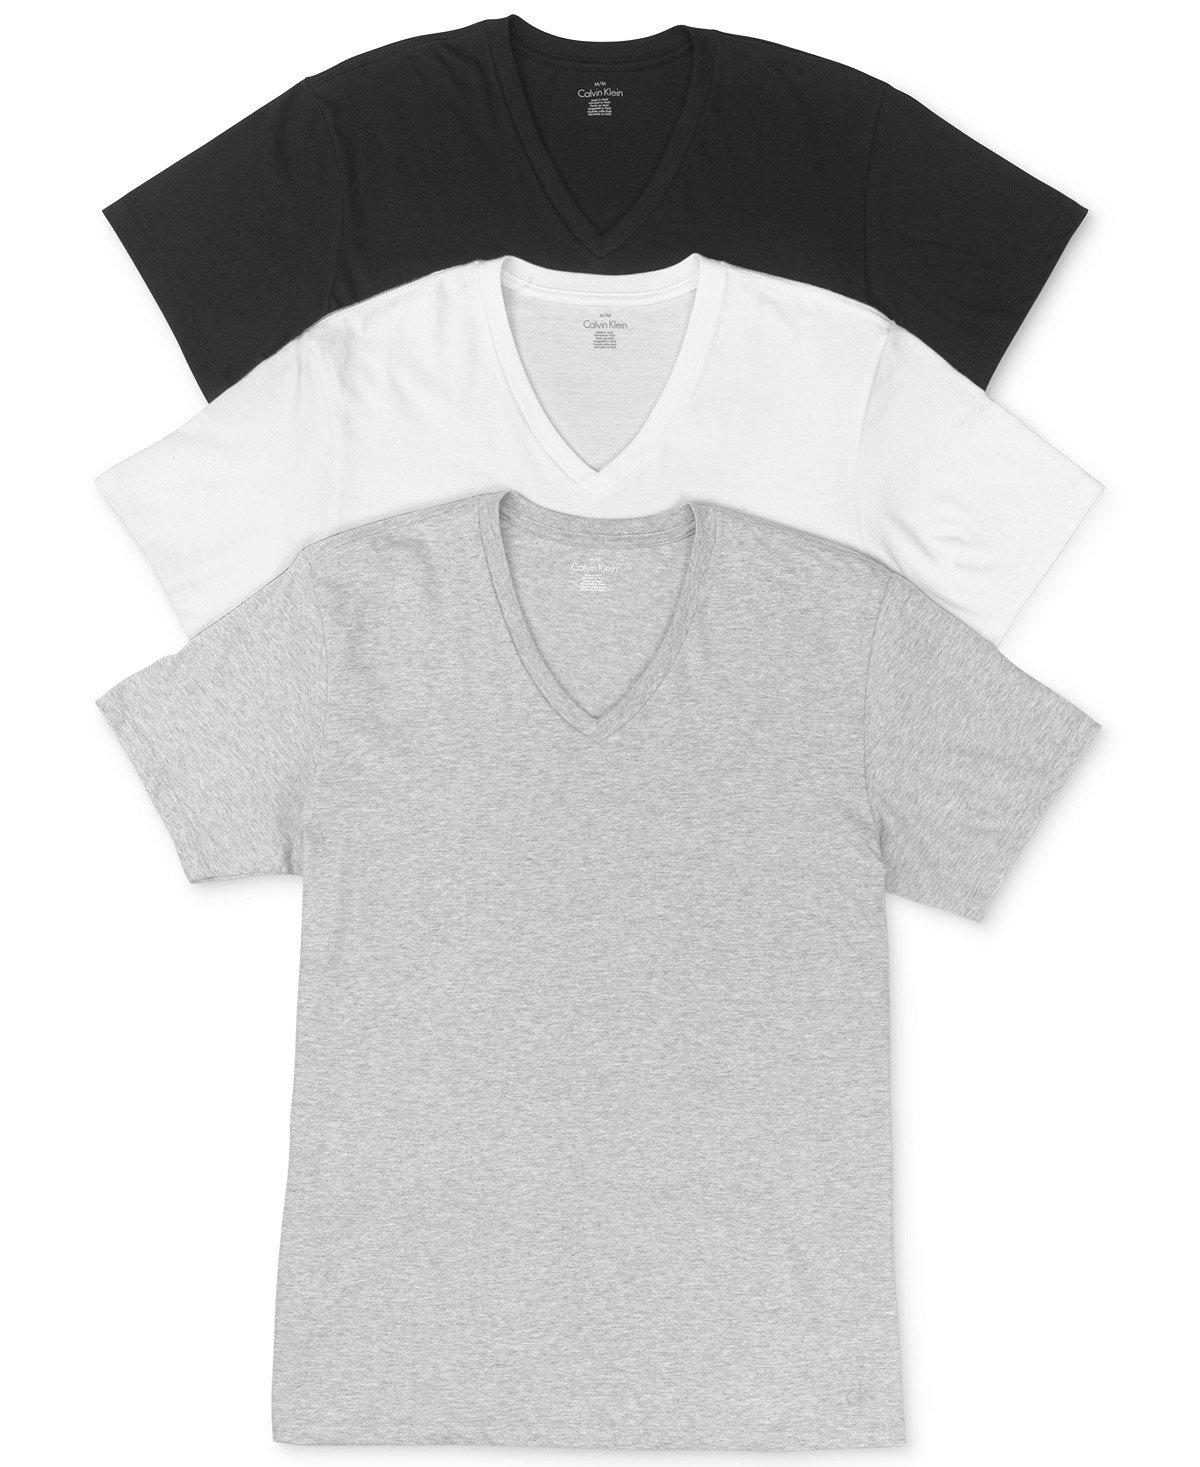 Calvin Klein Men`s 3-Pack Classic Fit Cotton V-Neck T-Shirts (White (M4065-900)/Heather Grey/Black, X-Large)